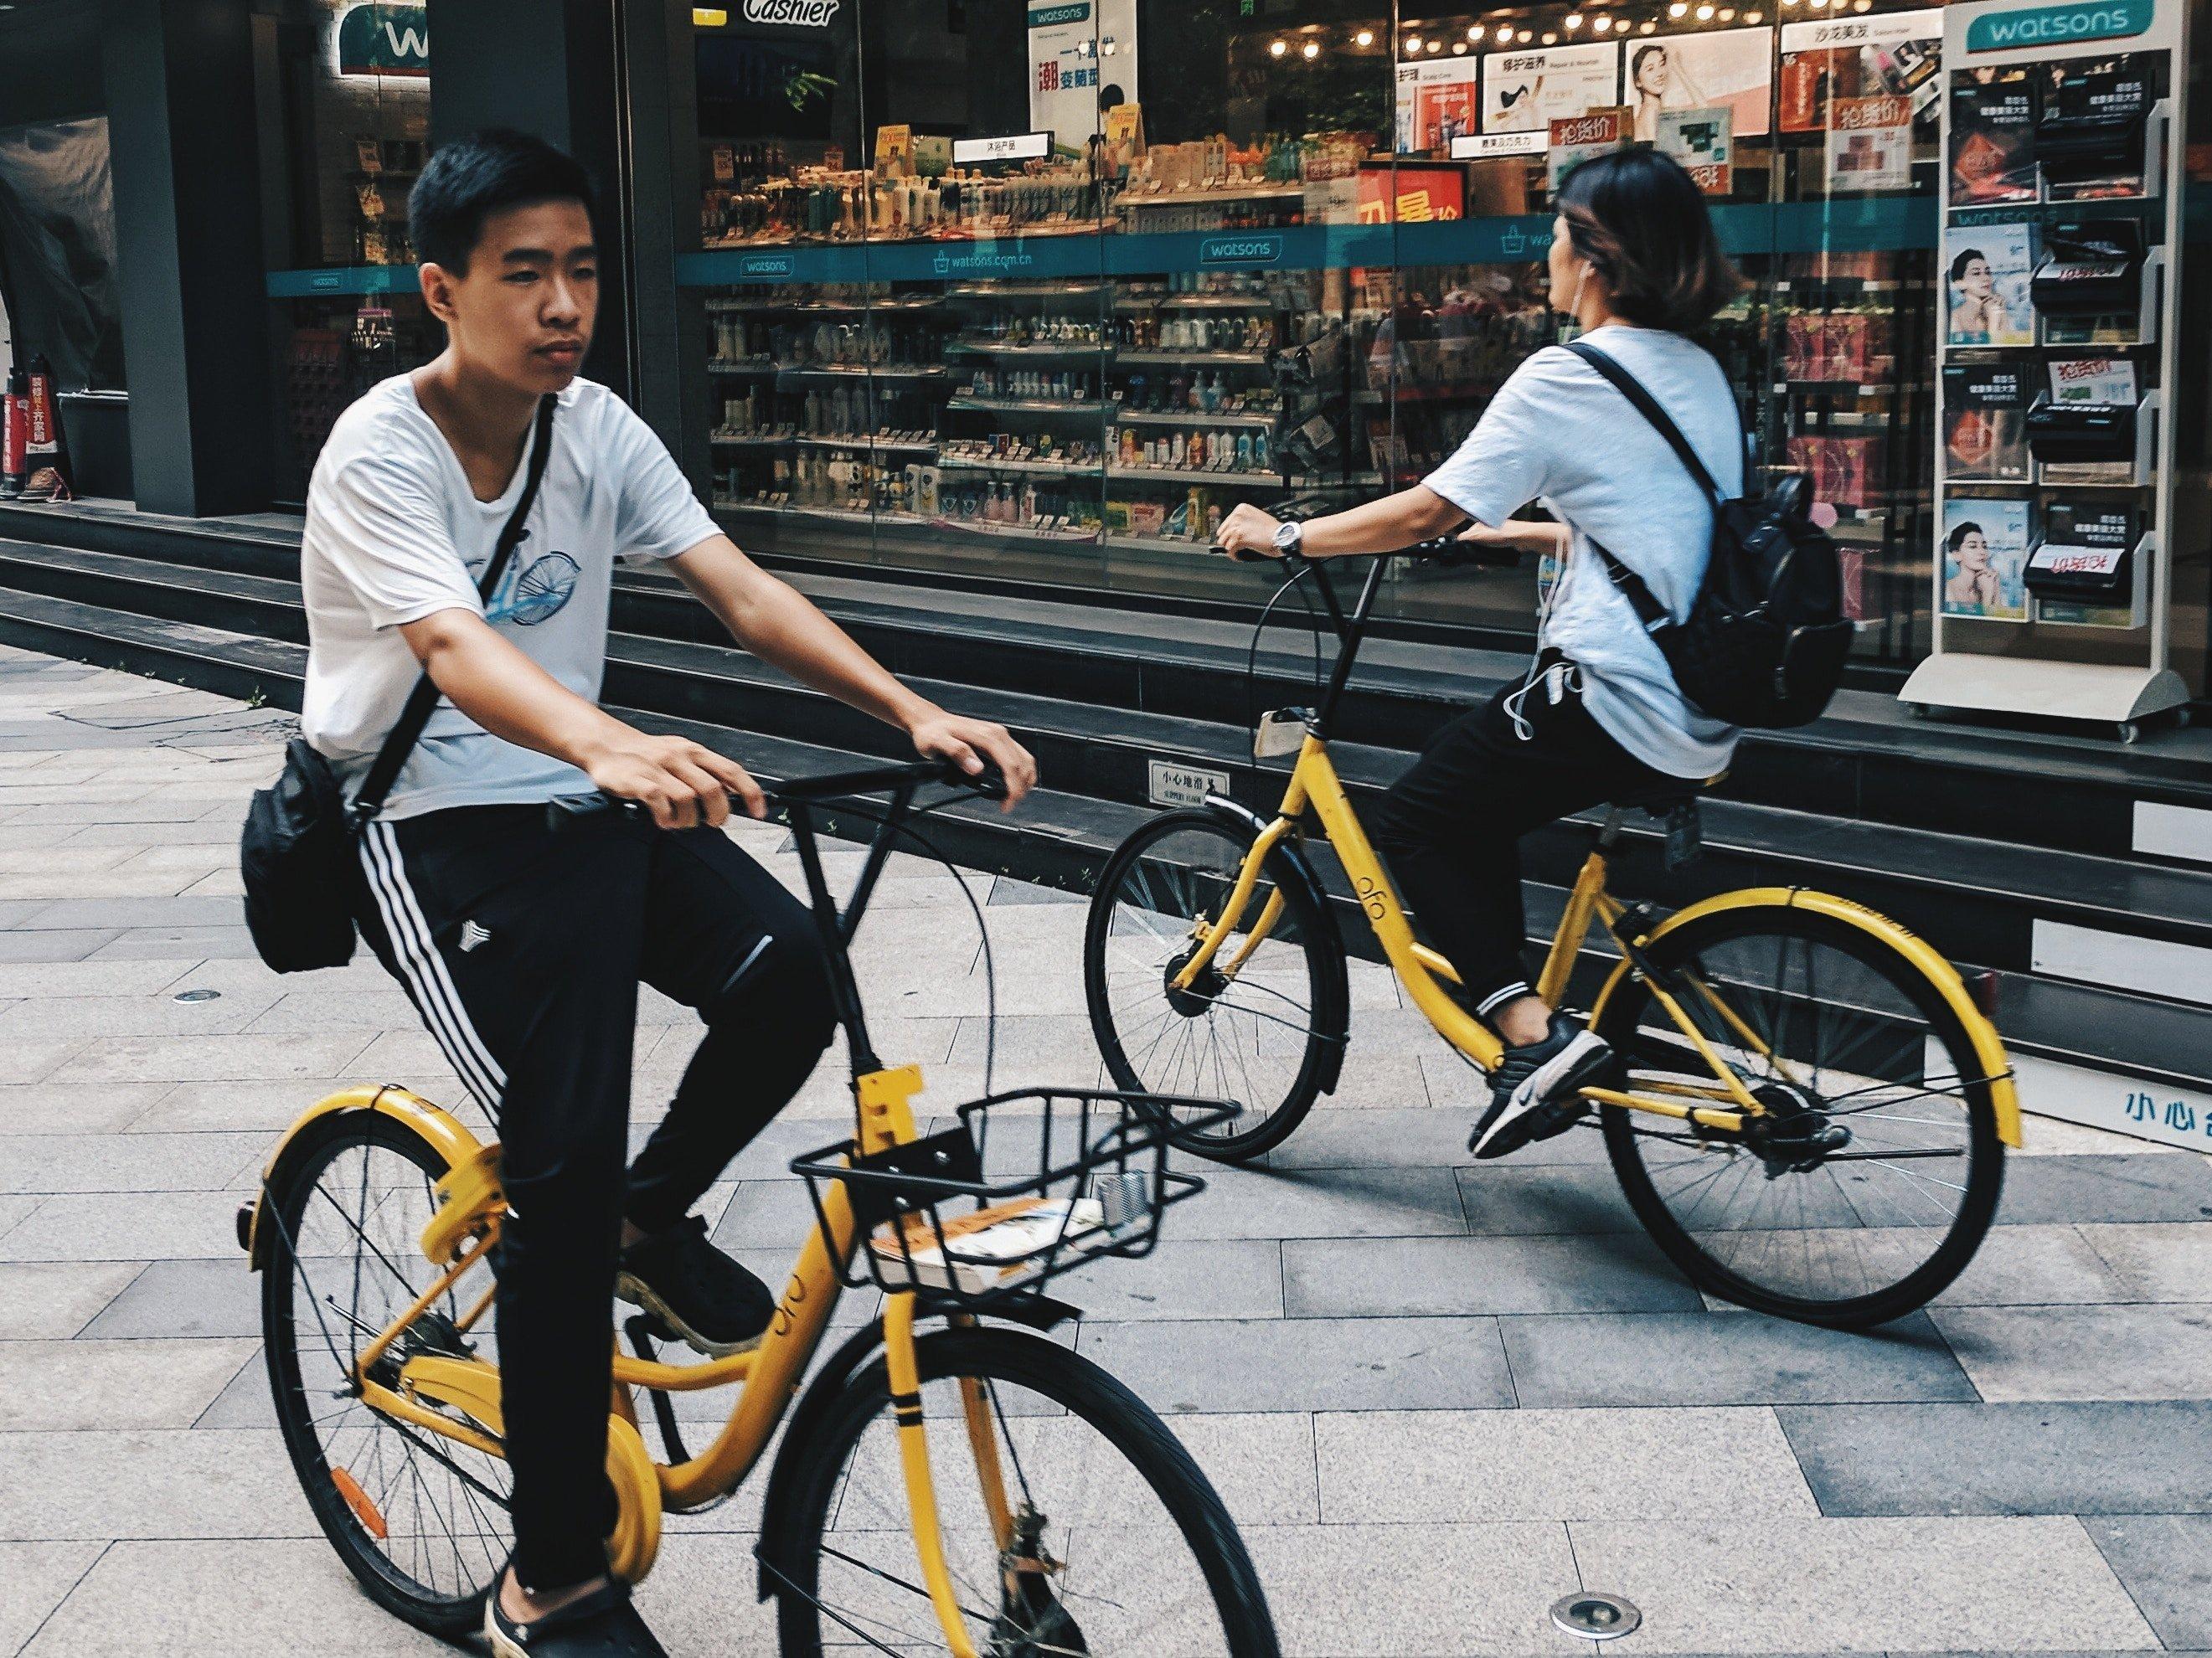 bikeshare-china-global-international-success-saturation-issues